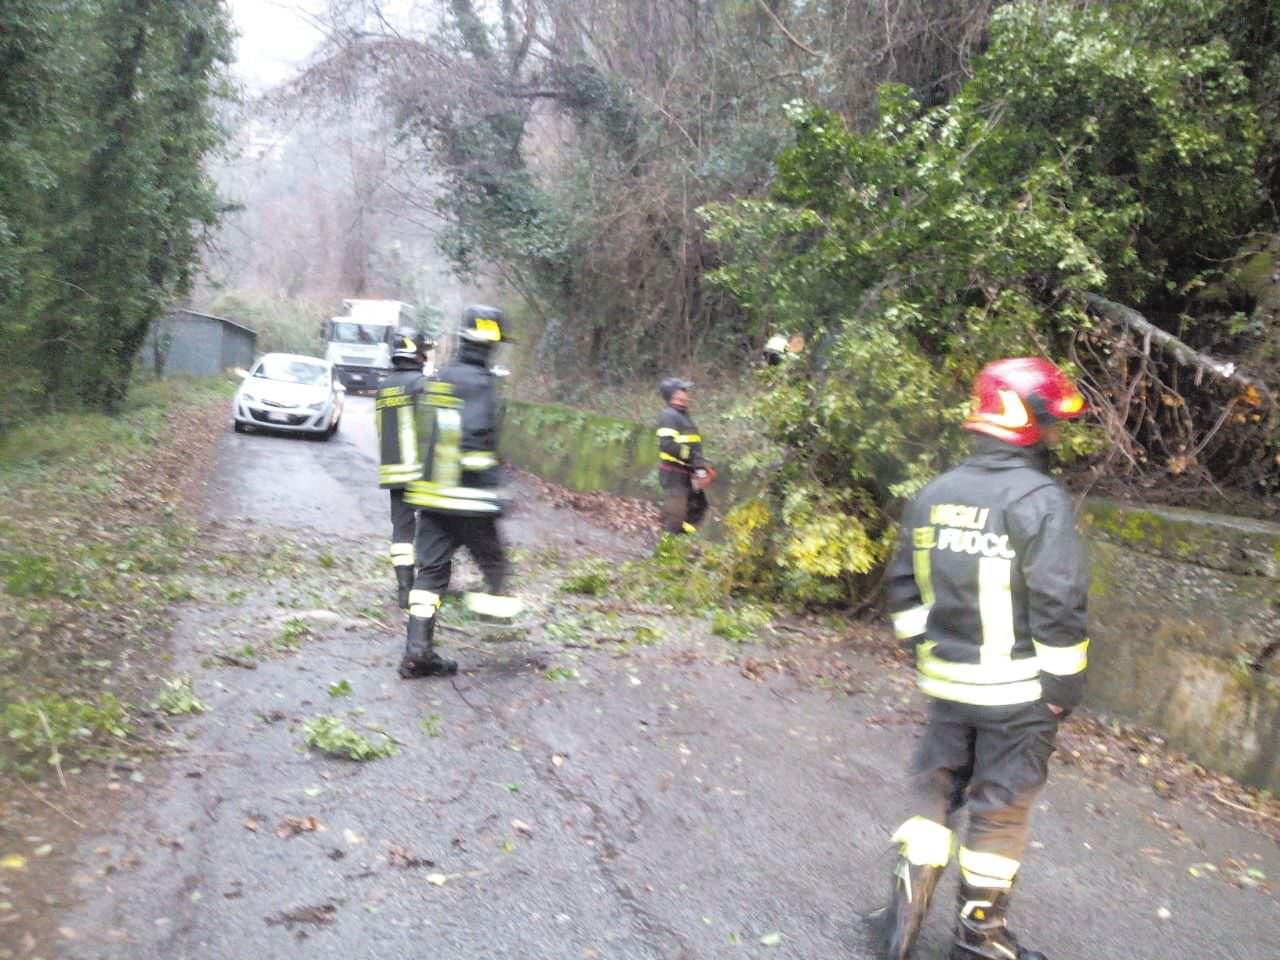 Cadono i rami, strada interrotta a Casoli (foto)